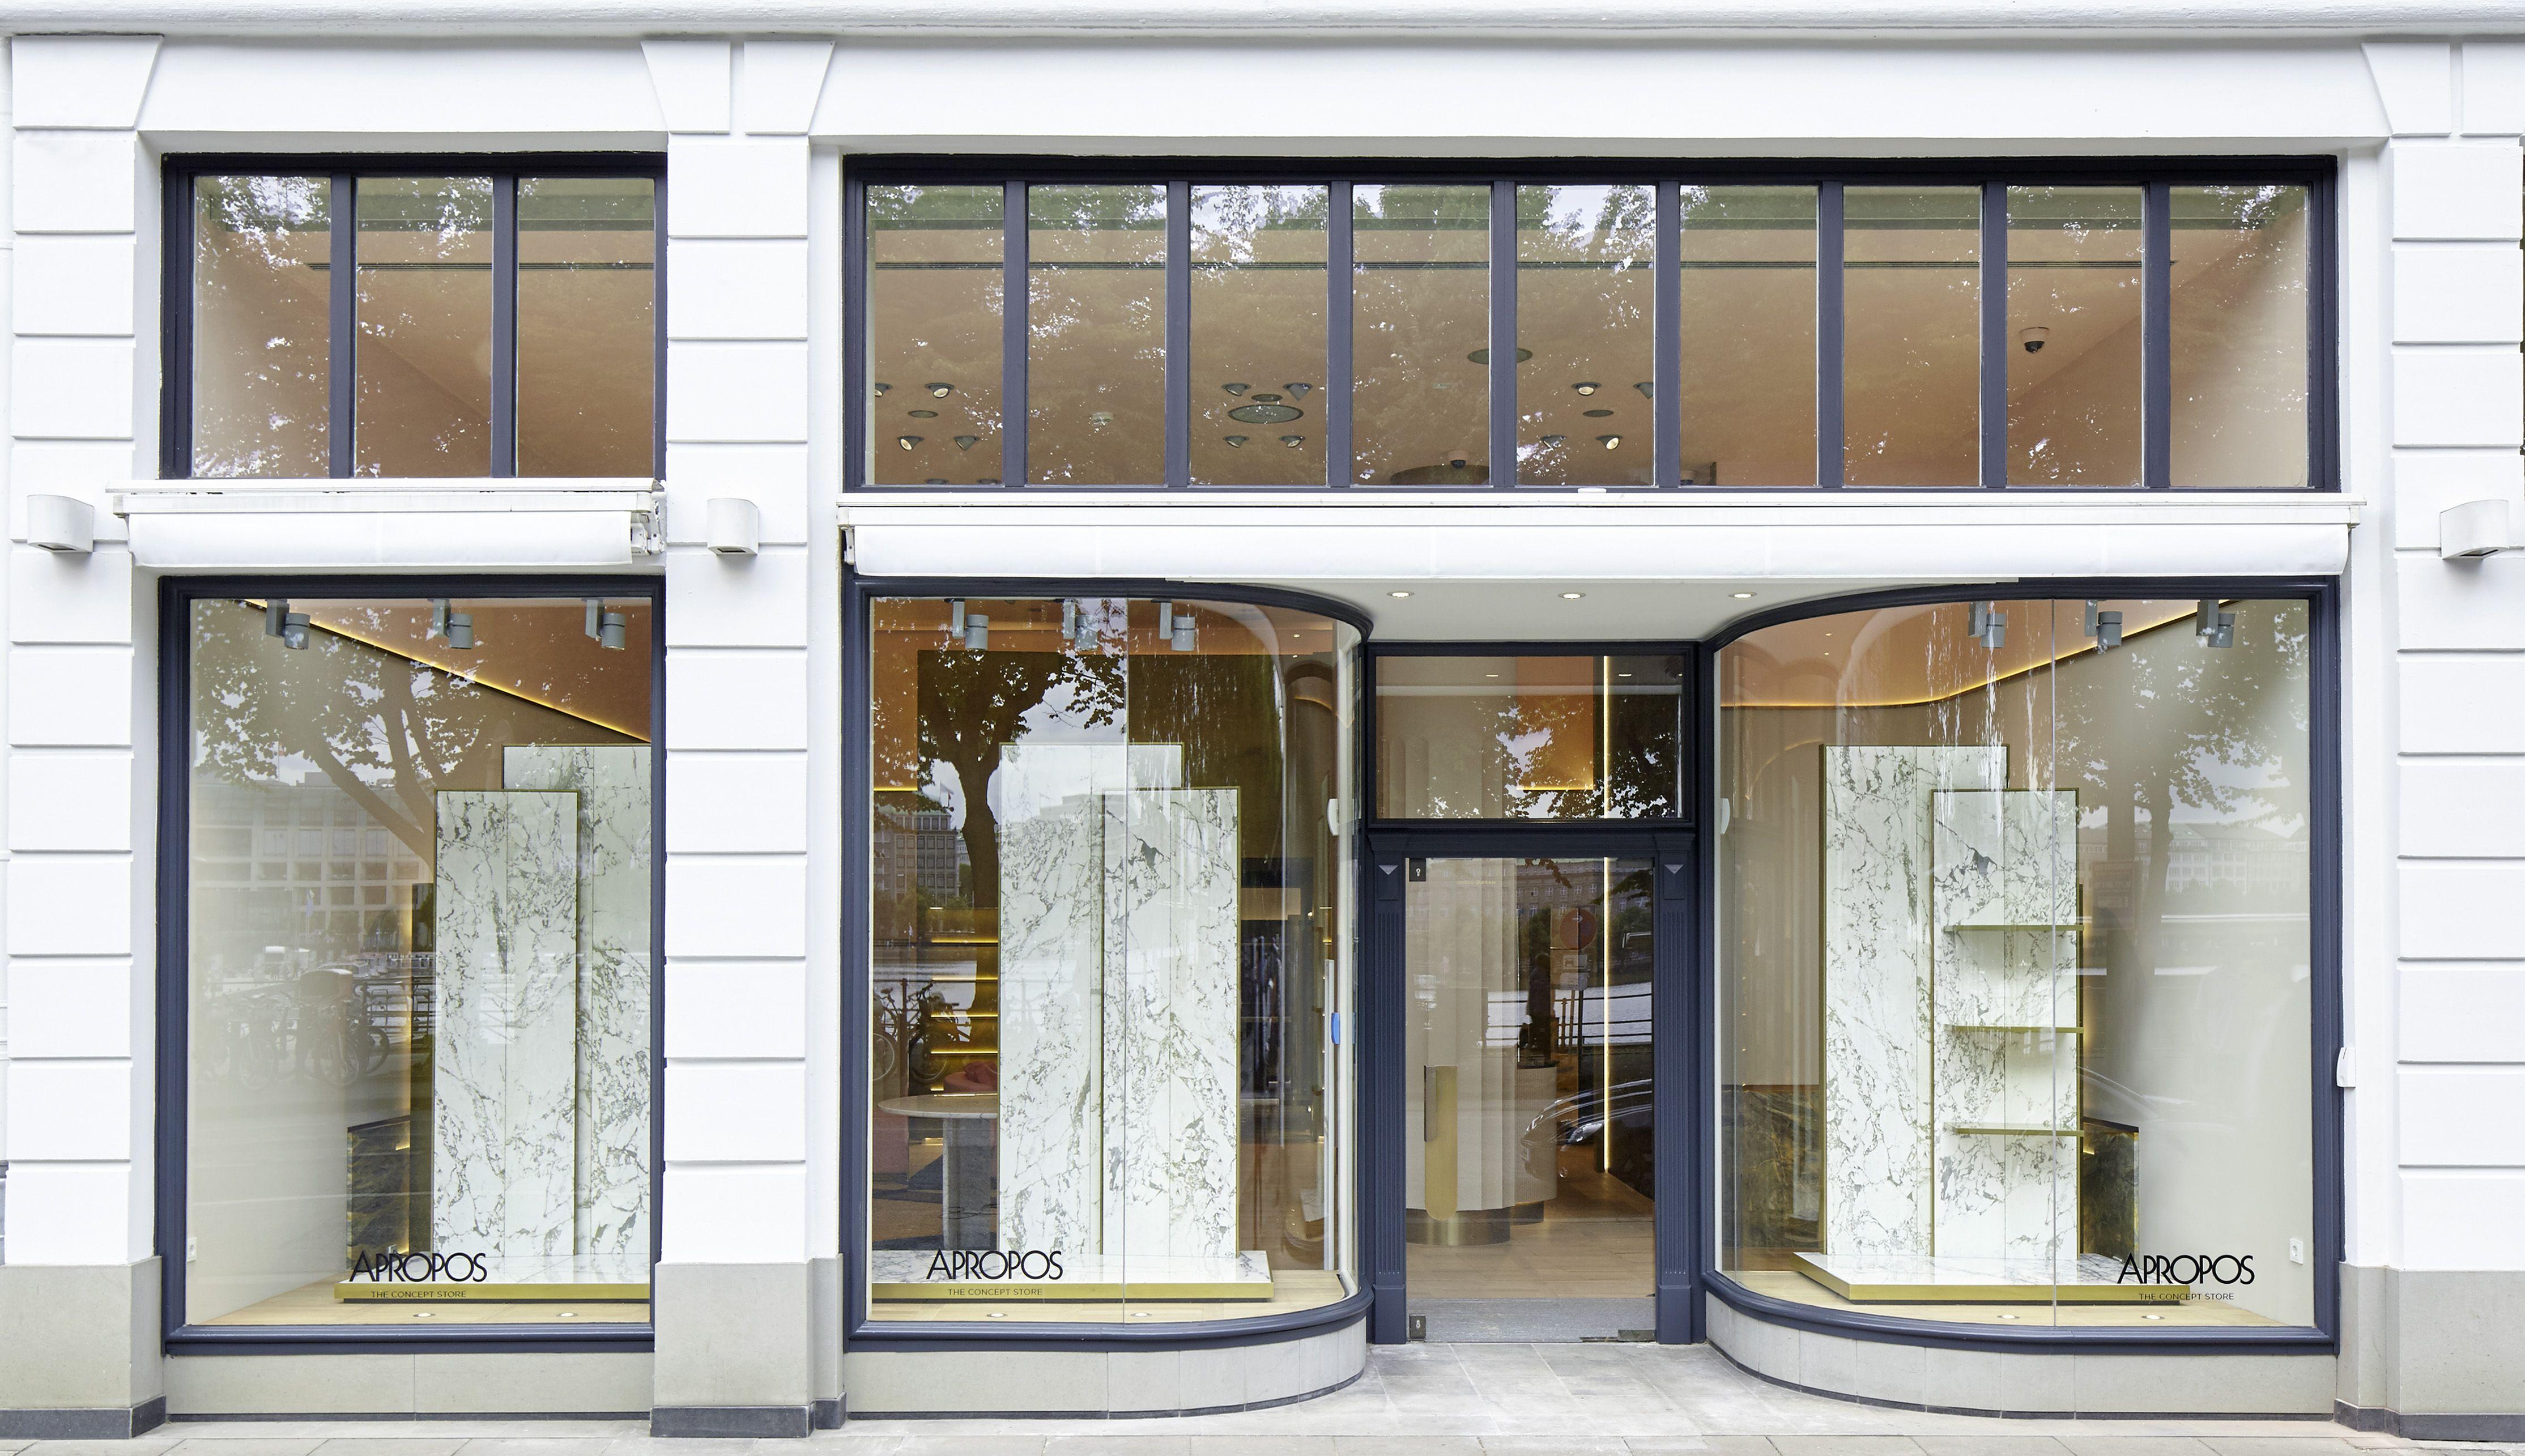 Concept Store Apropos Hamburg Men Flagship Shopwindow Retail Design By Rodolphe Parente Architecture Design Architecture Facade Boutique